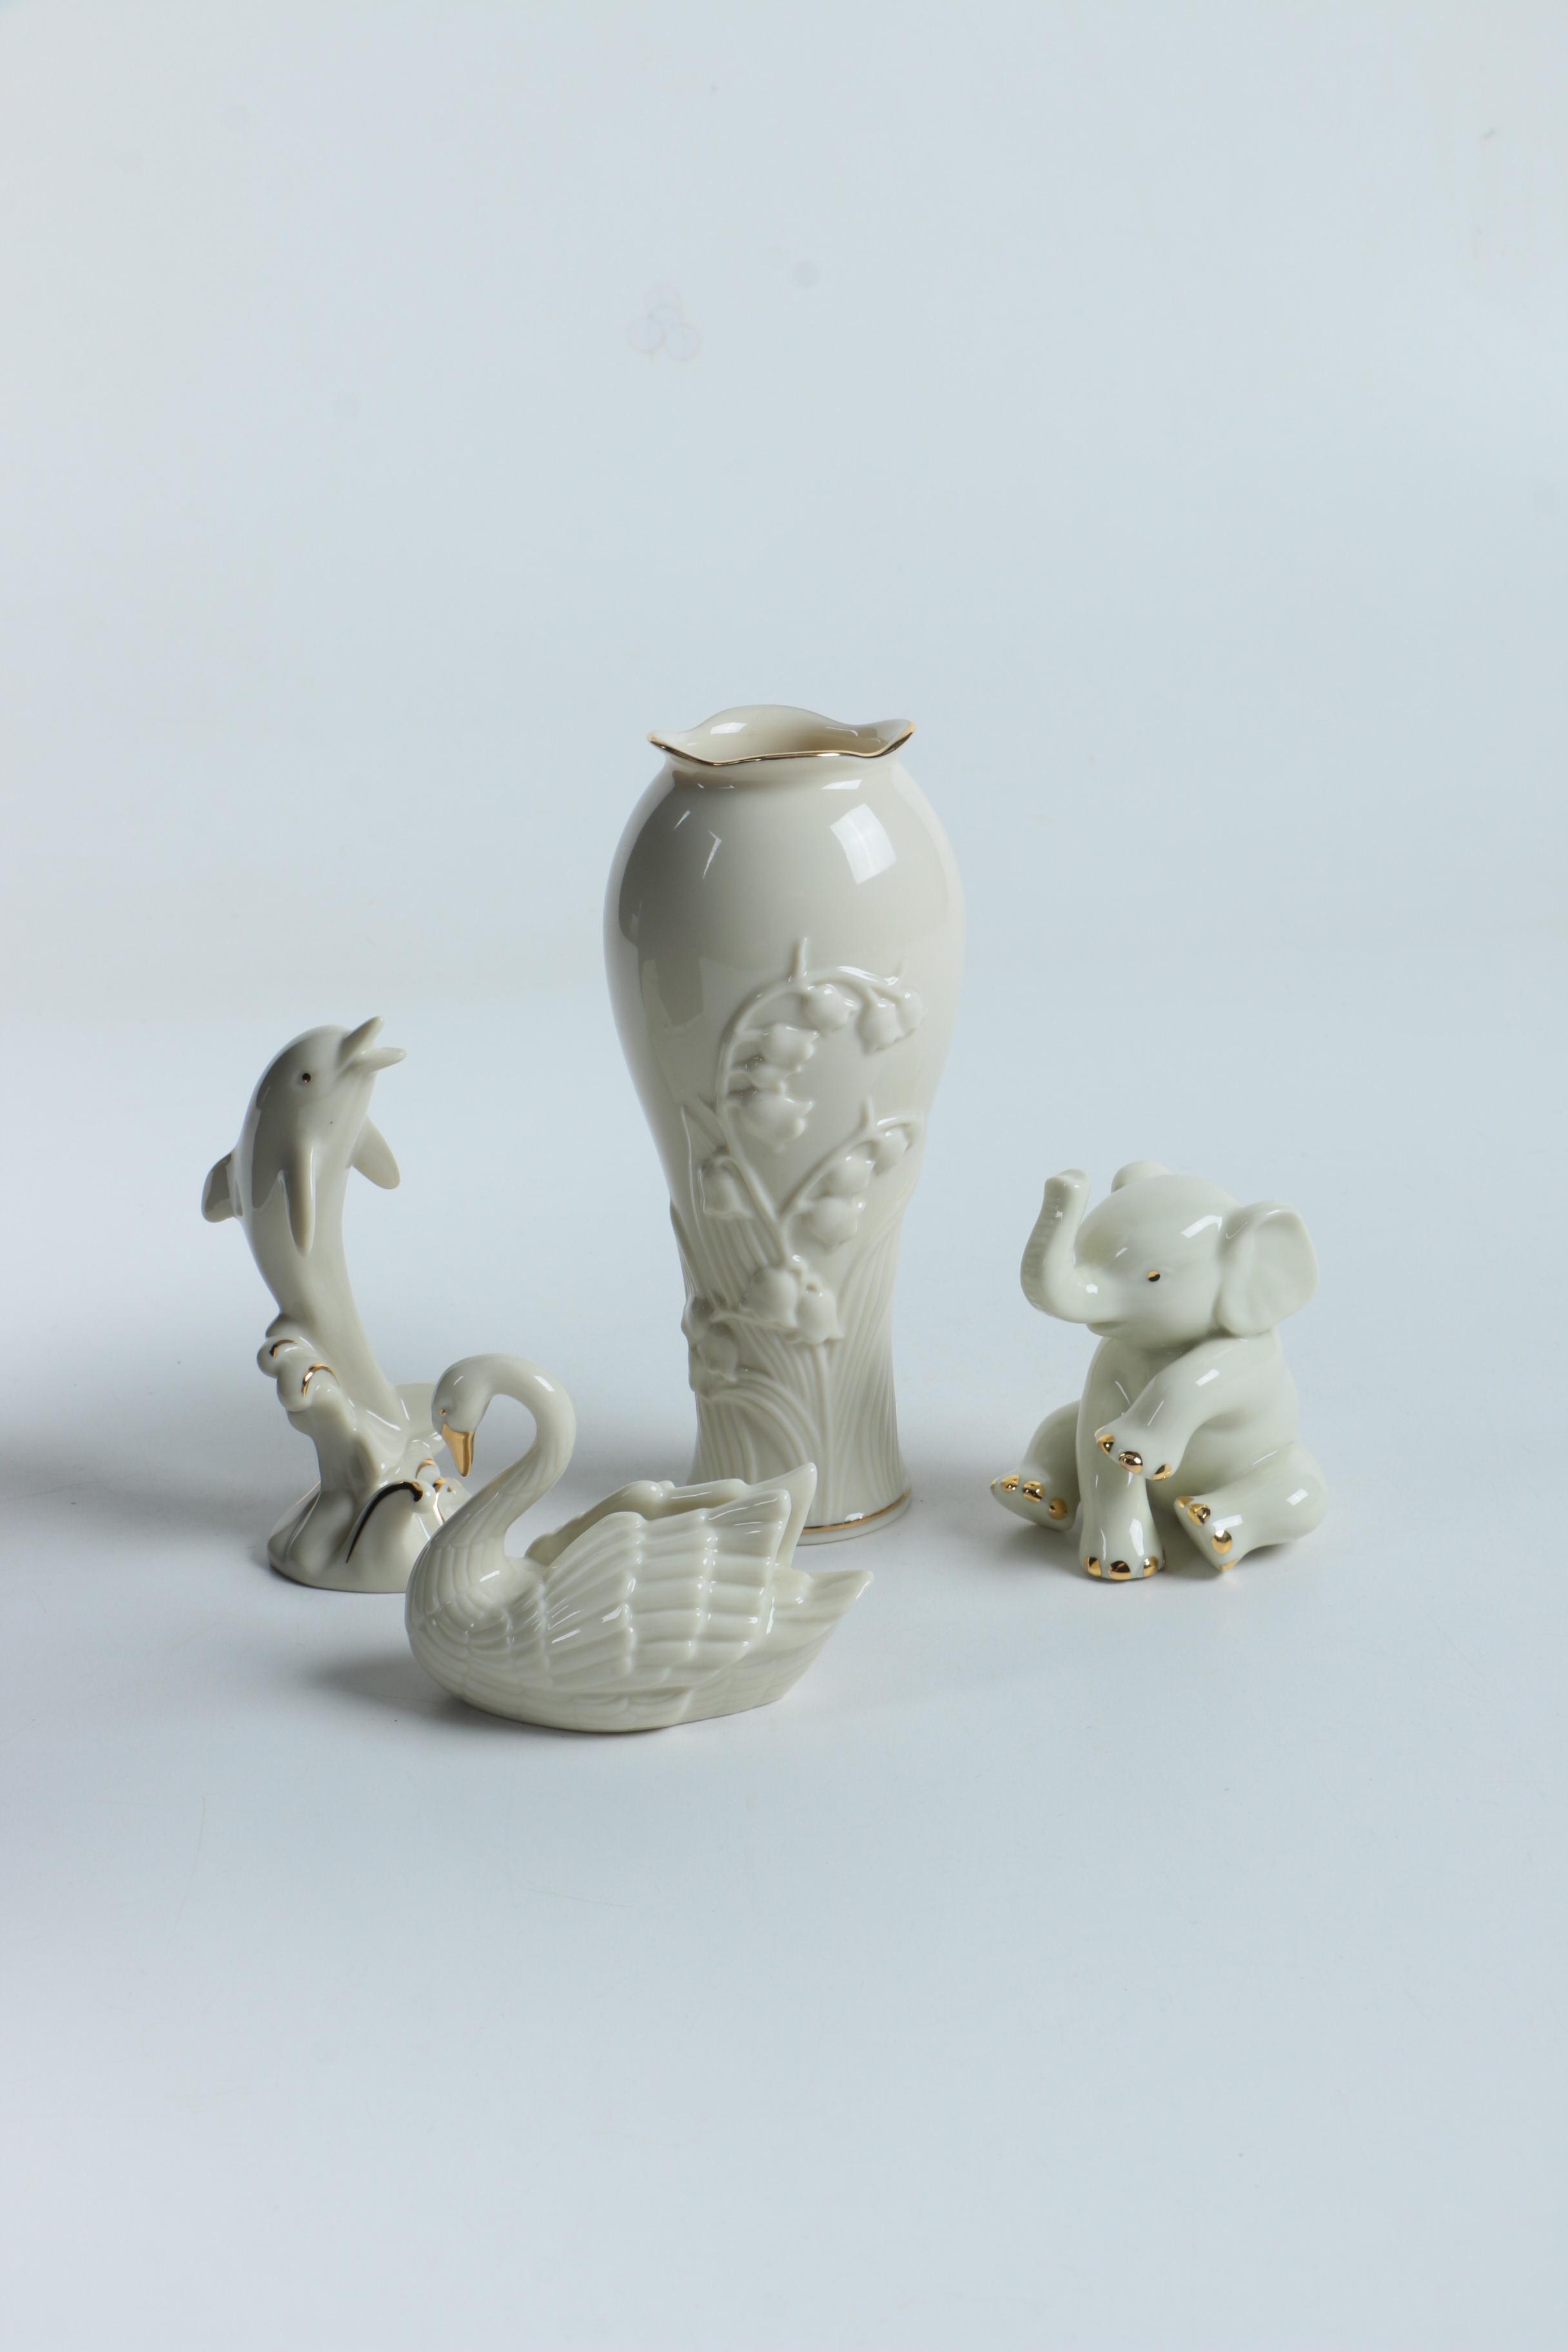 Lenox vases lenox 12 in harlequin crystal vase lenox woodland lenox bluebell bud vase and animal figurines reviewsmspy